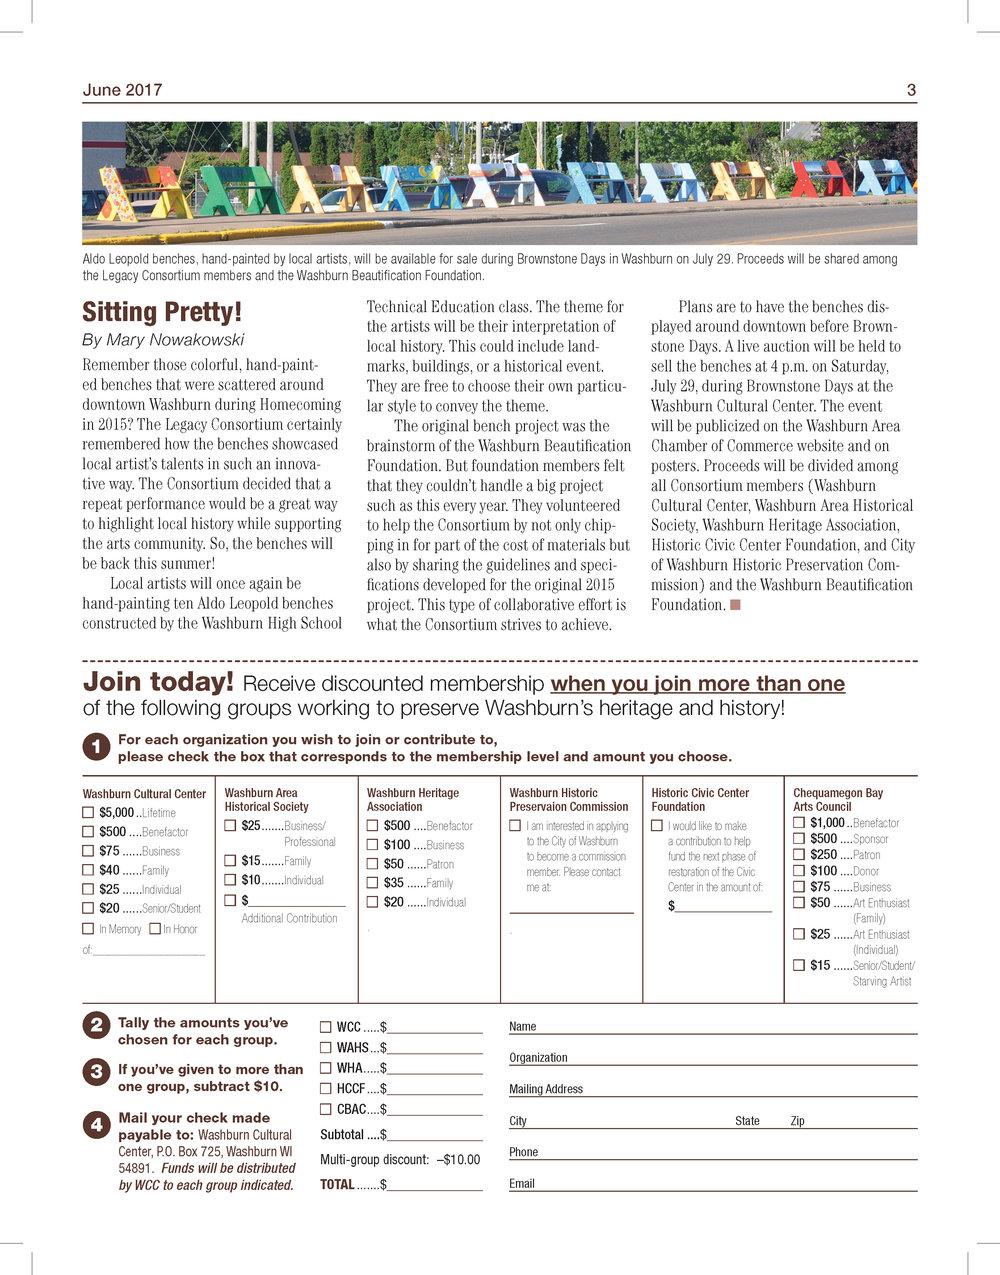 Brownstone_Summer2017_6.20.17_FINAL_crops_Page_3.jpg